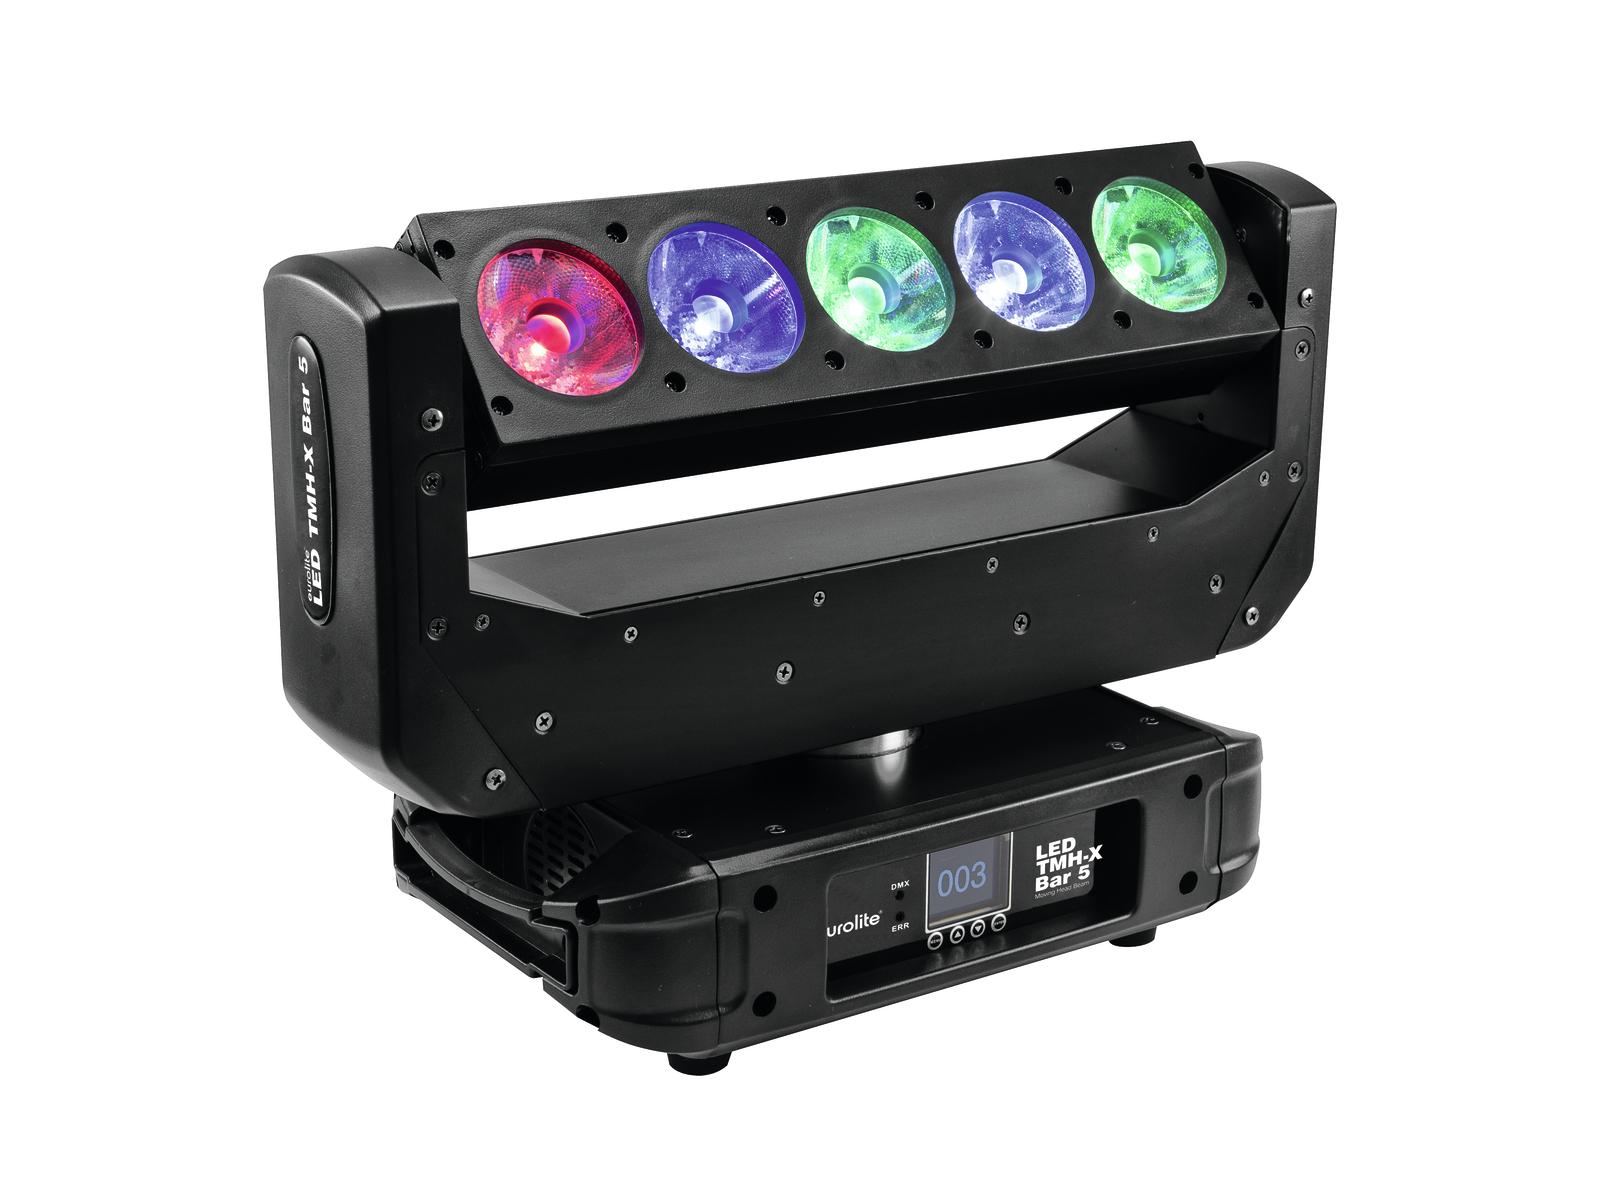 eurolite-led-tmh-x-bar-5-moving-head-beam